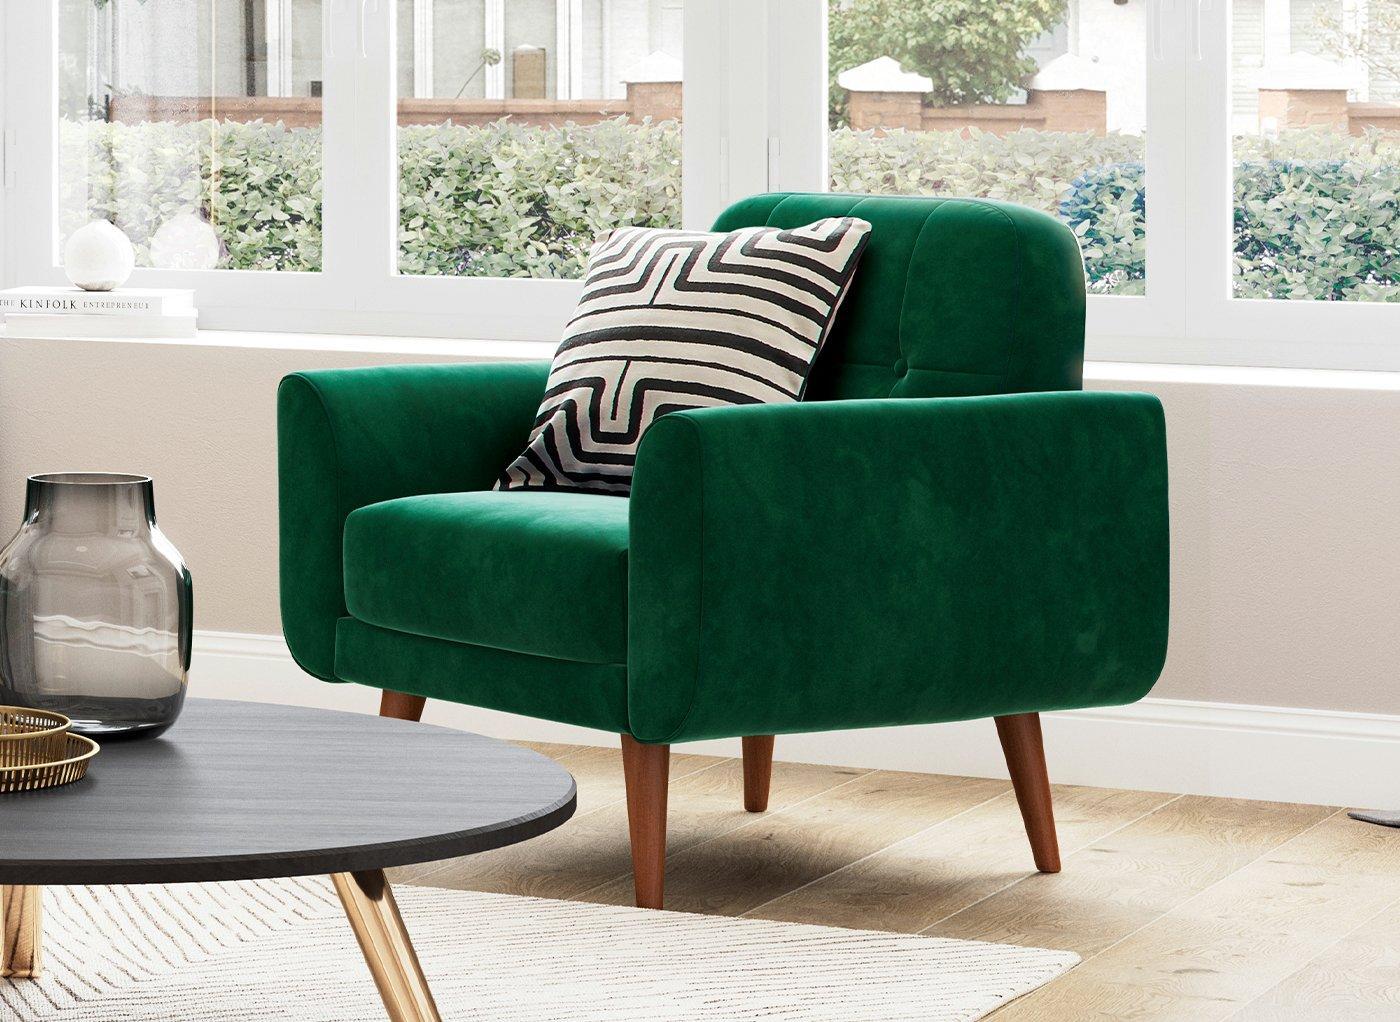 gallway-chair